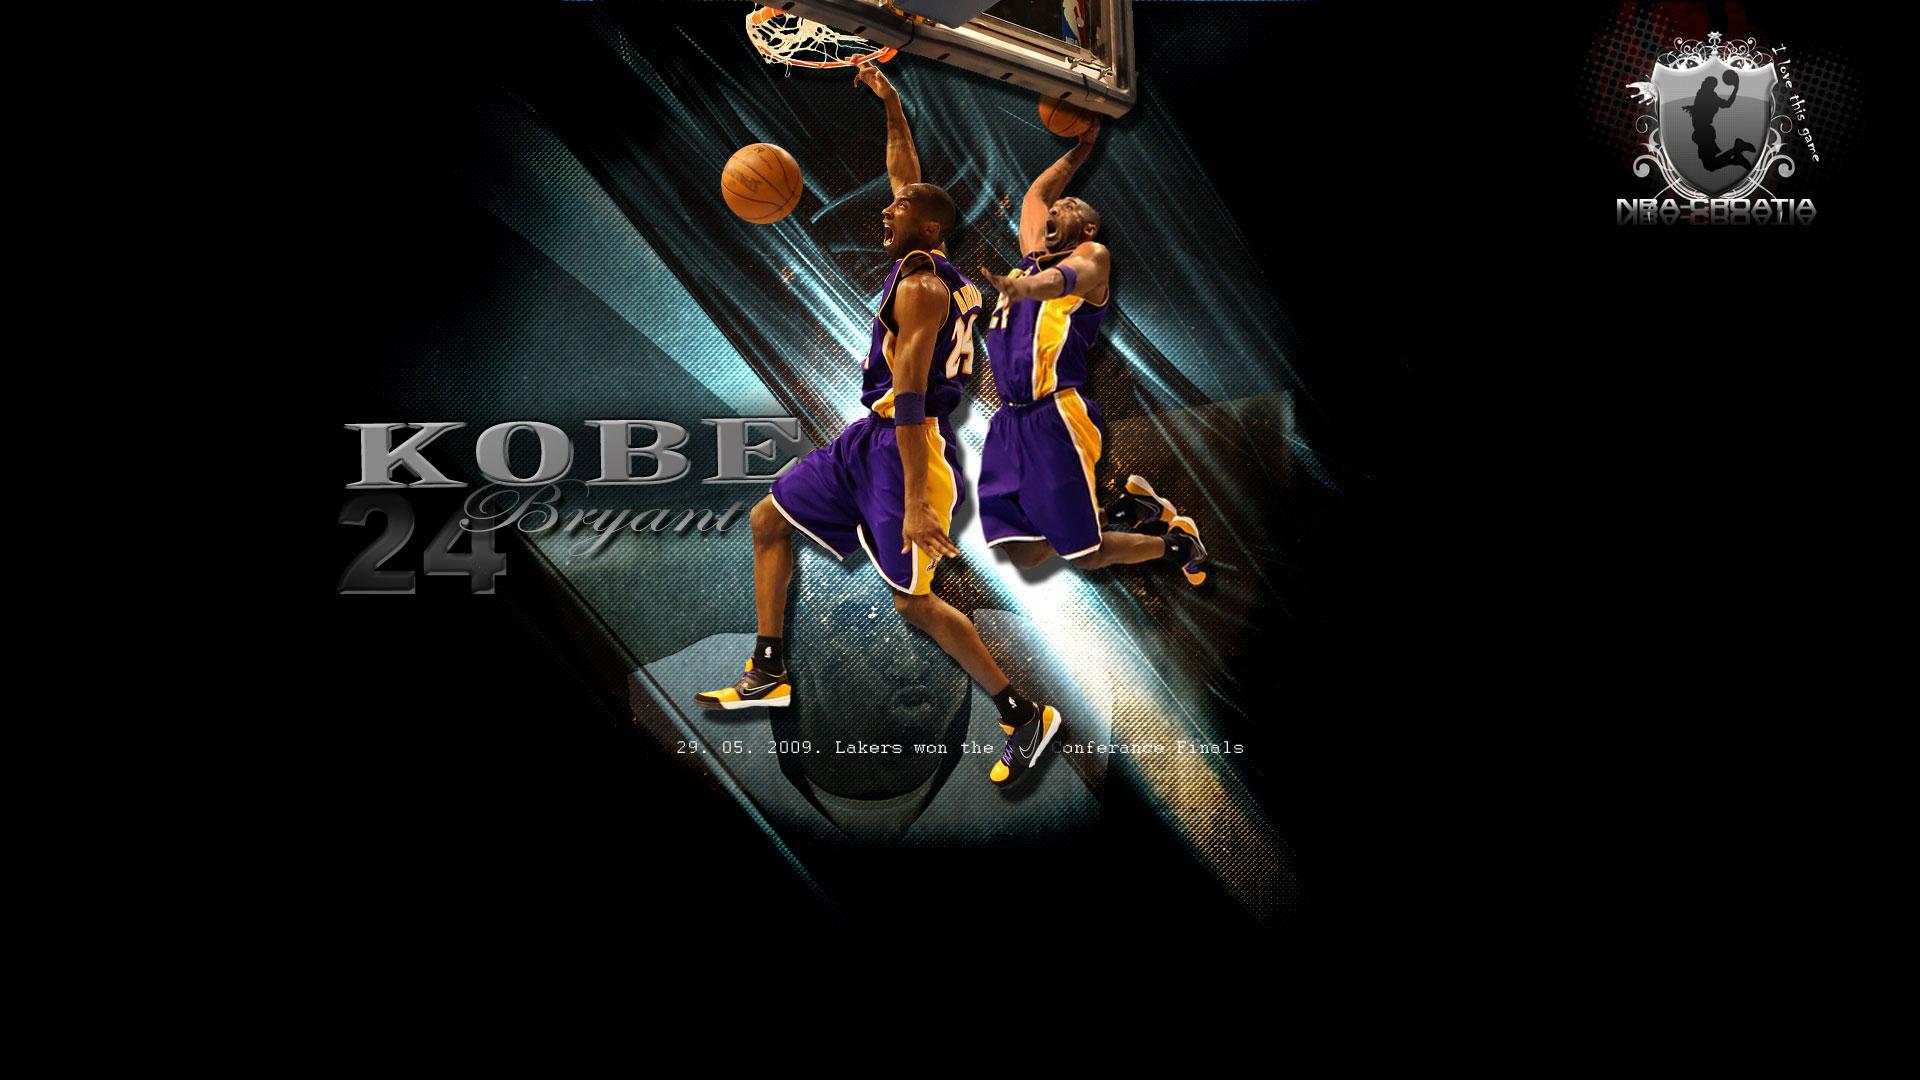 Kobe Bryant Wallpaper Dunk 14 1920x1080